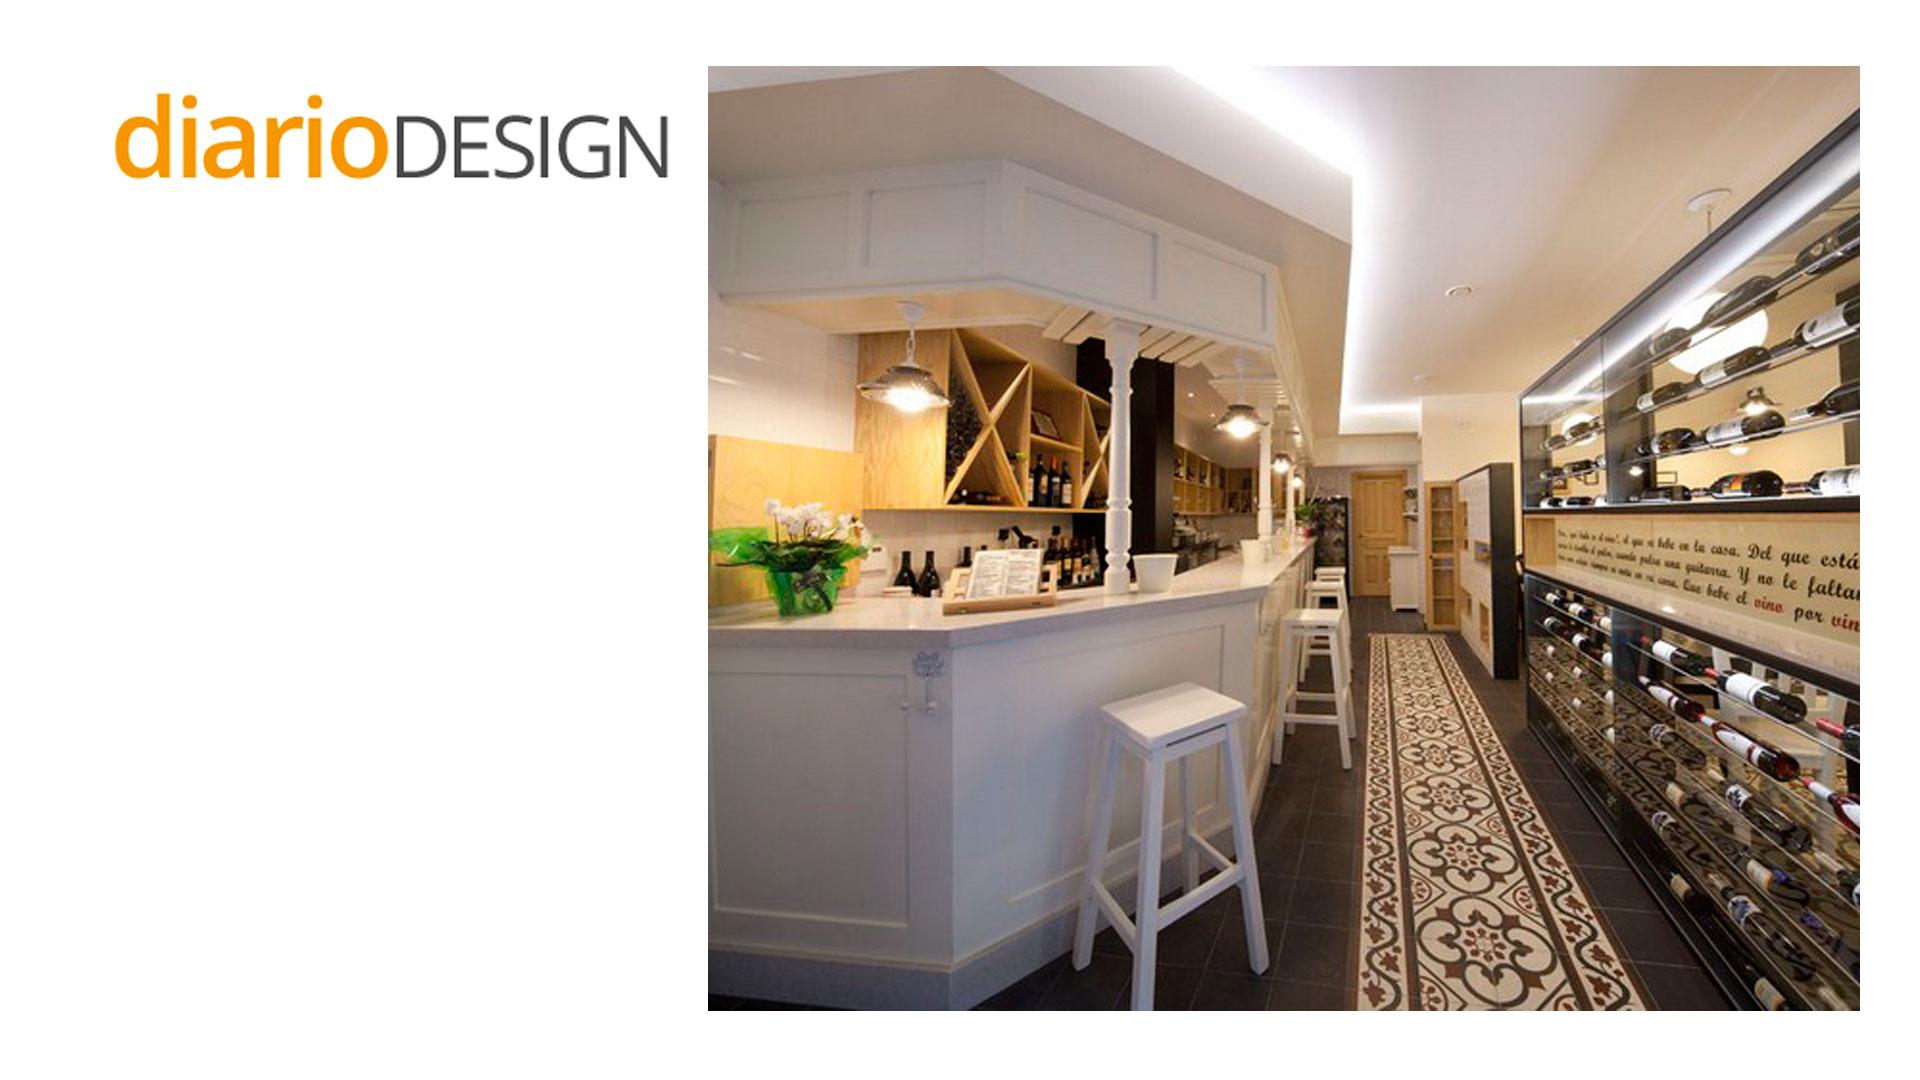 vinoteca-blas-diario-design